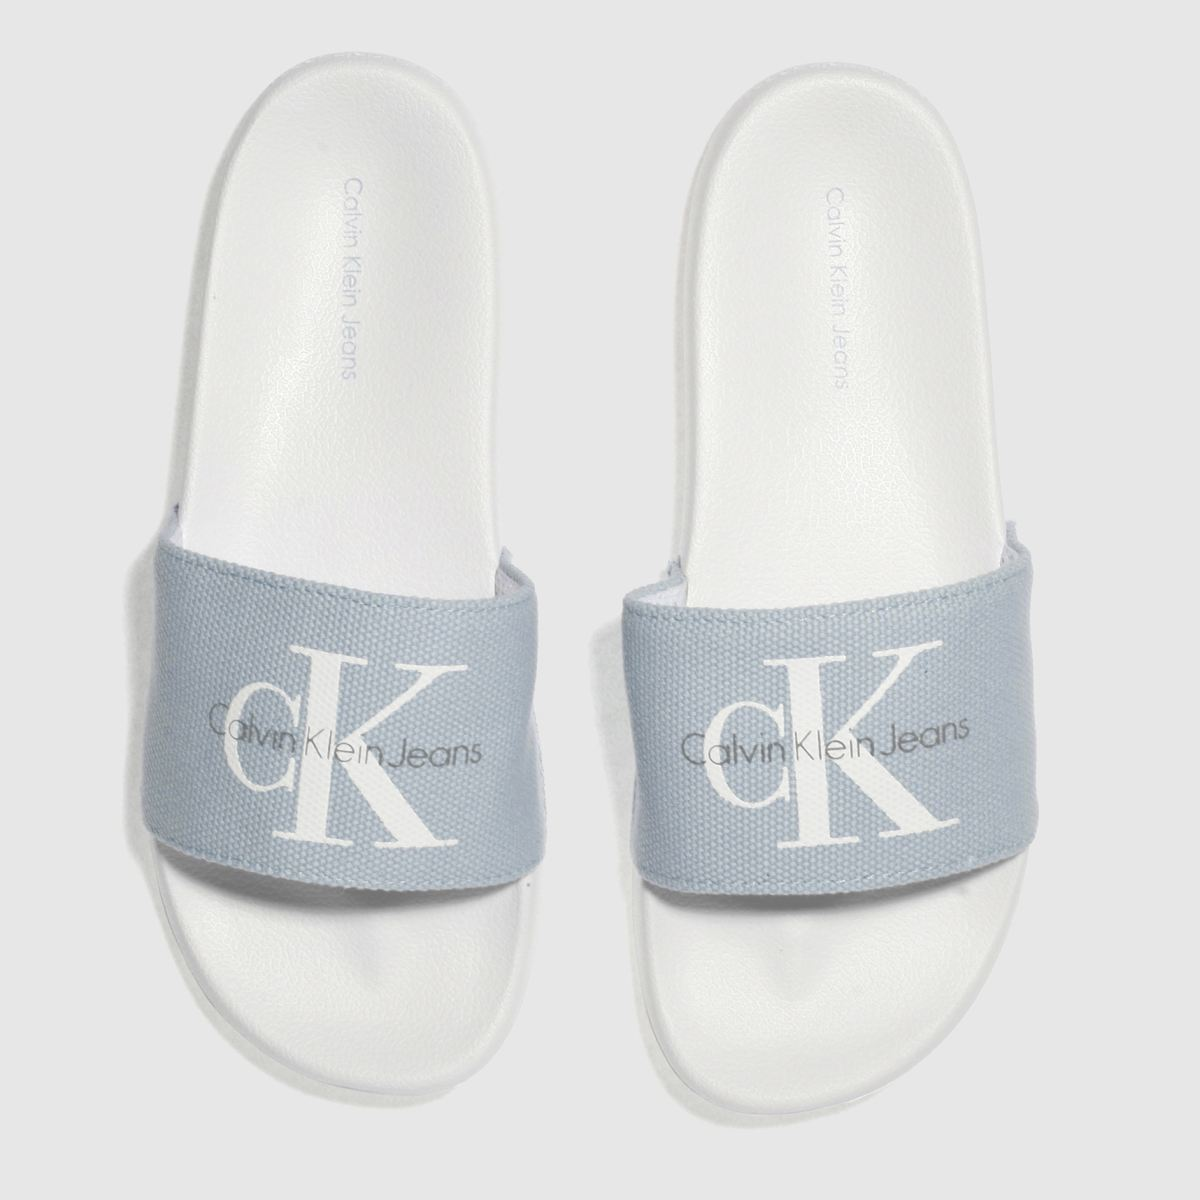 Calvin Klein Pale Blue Chantal Heavy Canvas Sandals